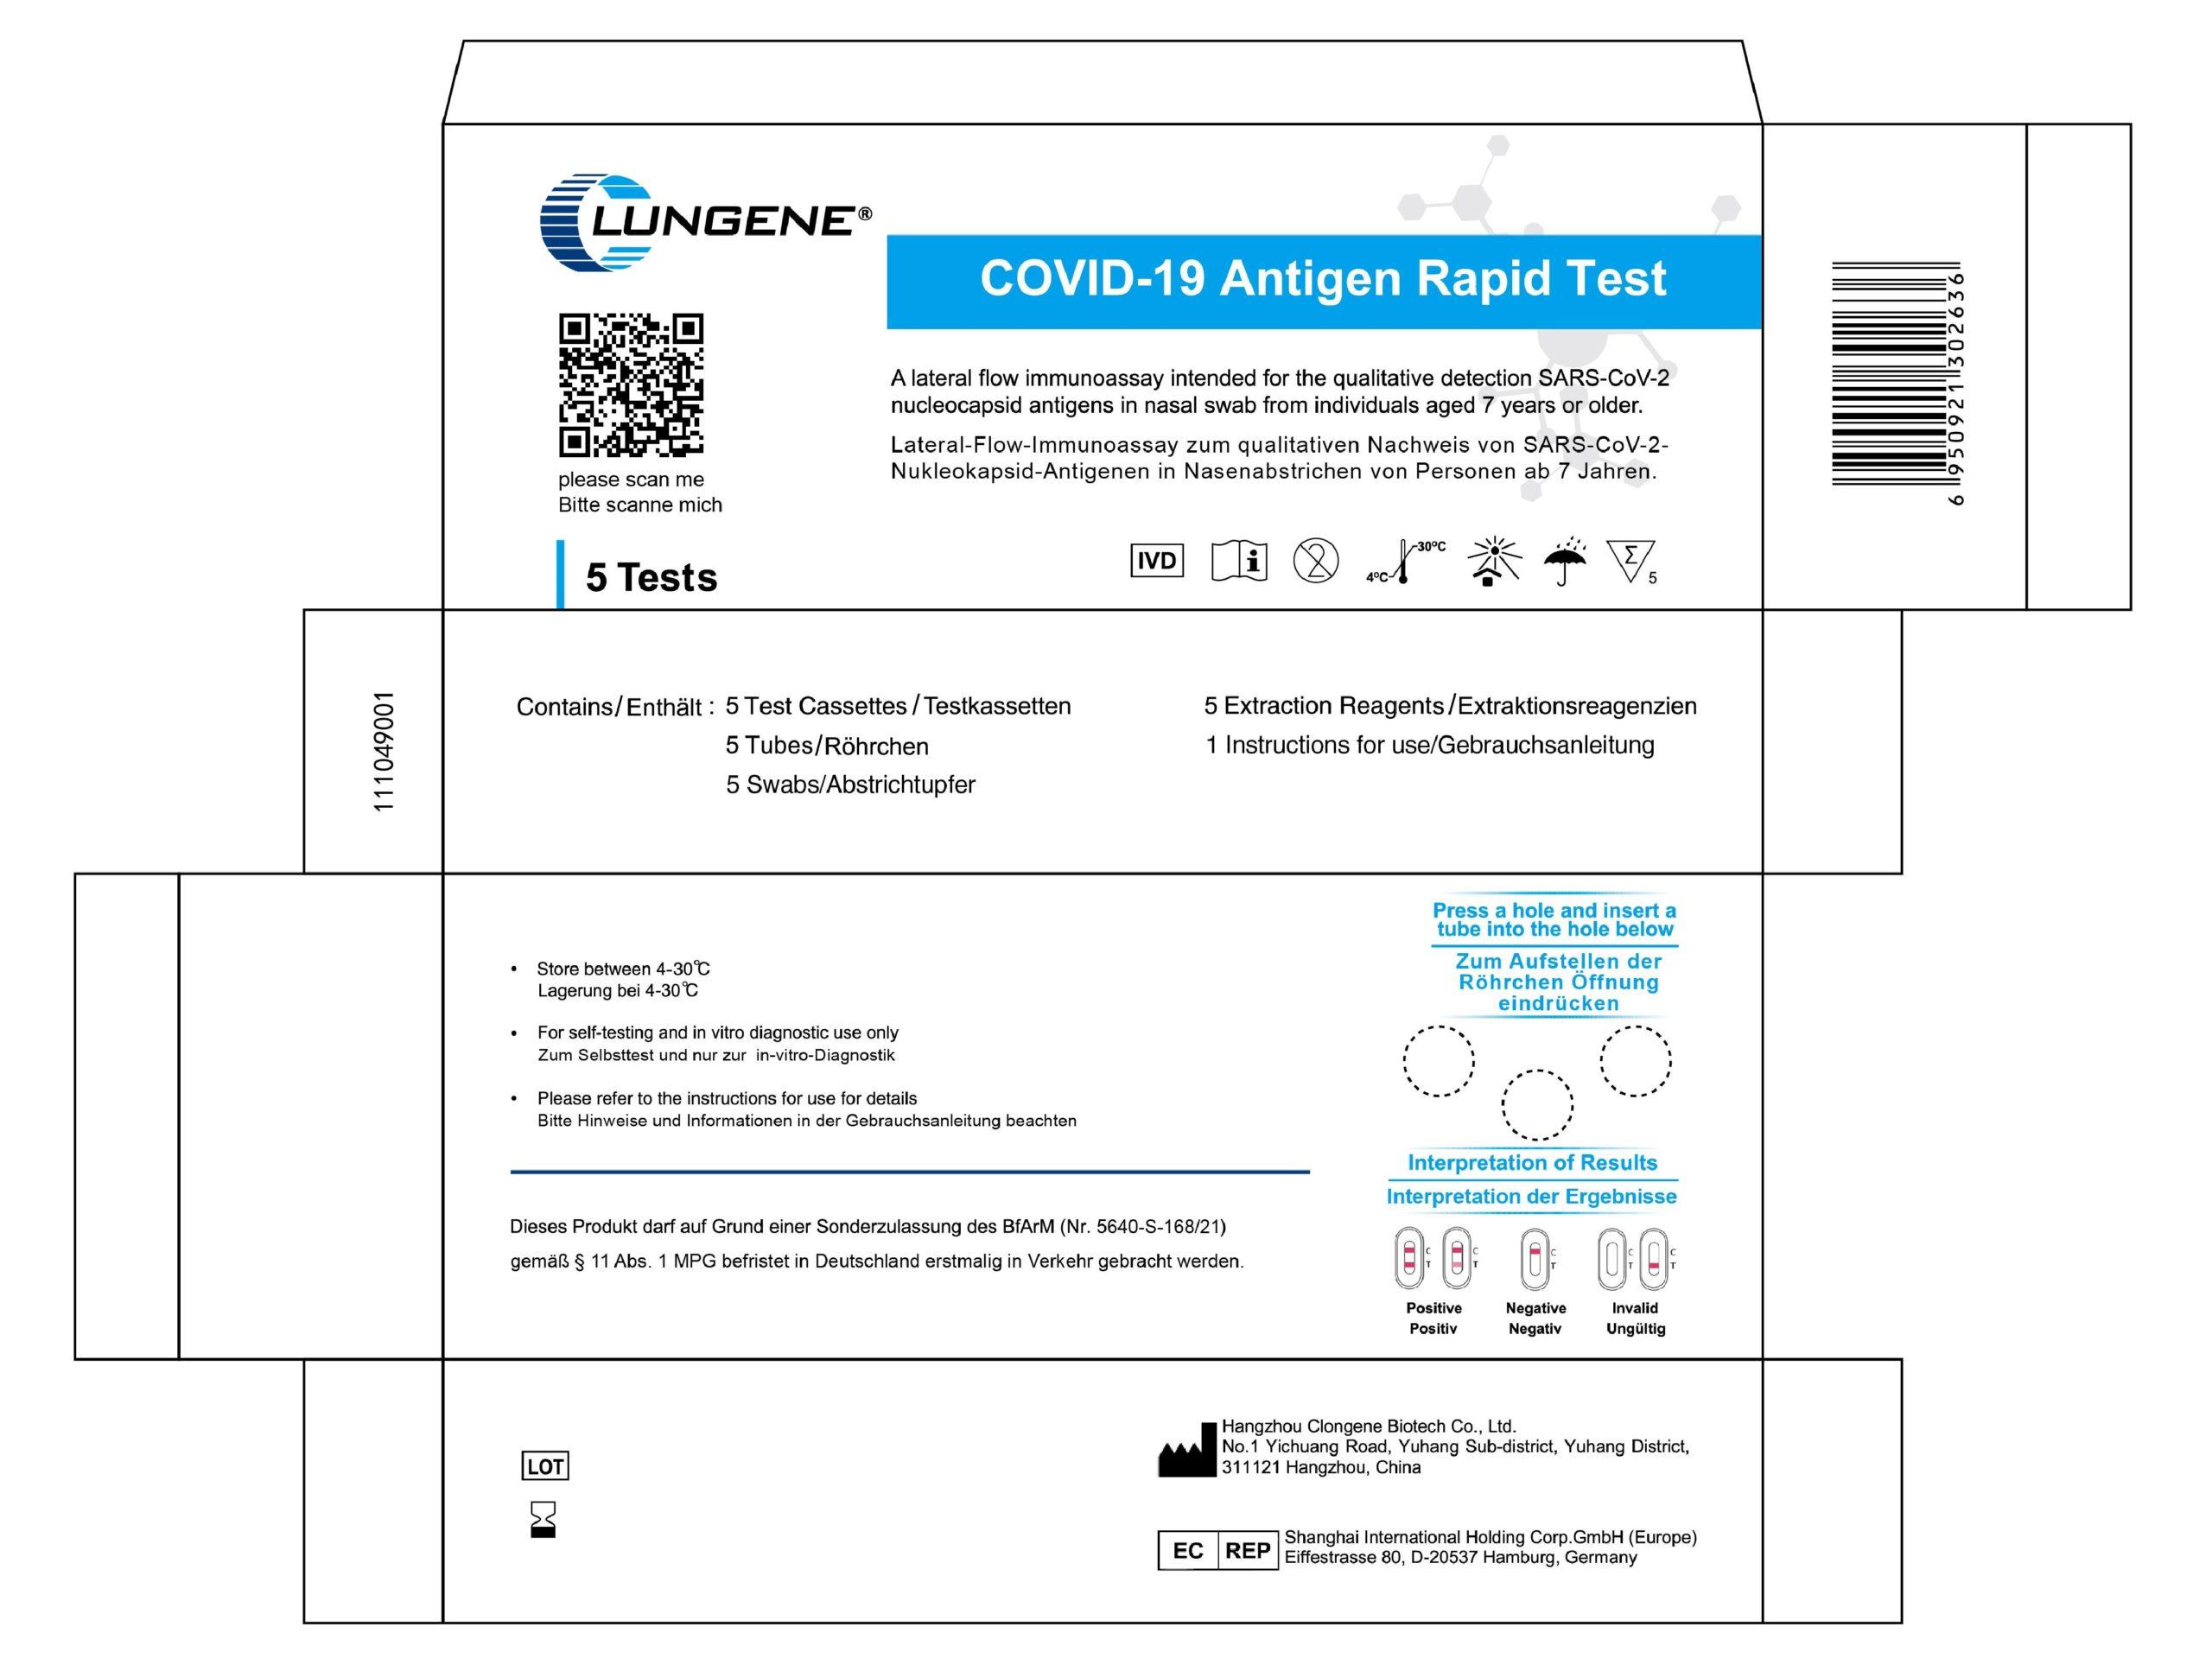 Verpackung COVID-19 Antigen Test